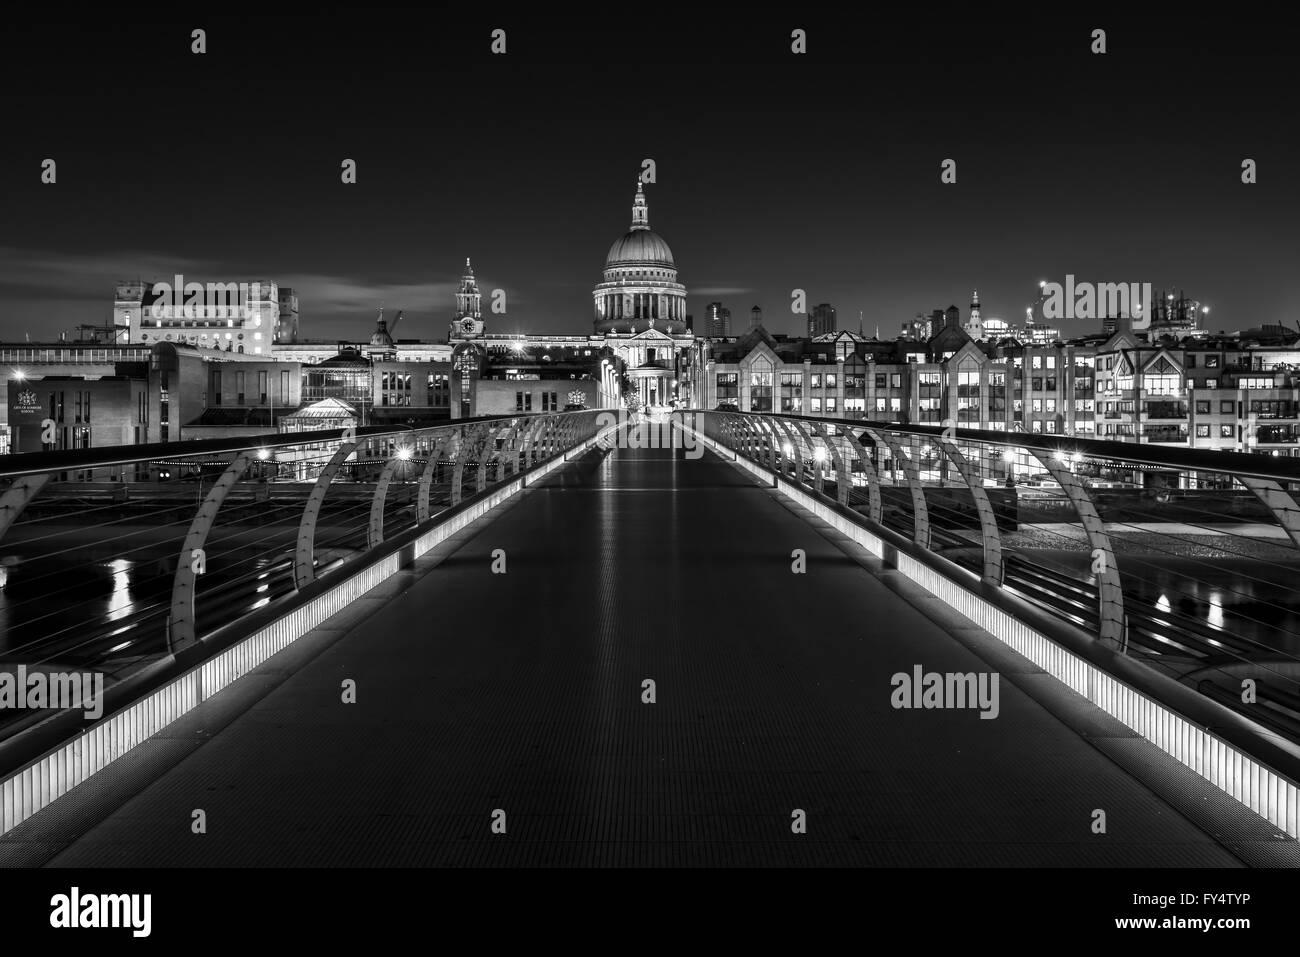 St Paul's Cathedral and Millennium Bridge, London, United Kingdom - Stock Image